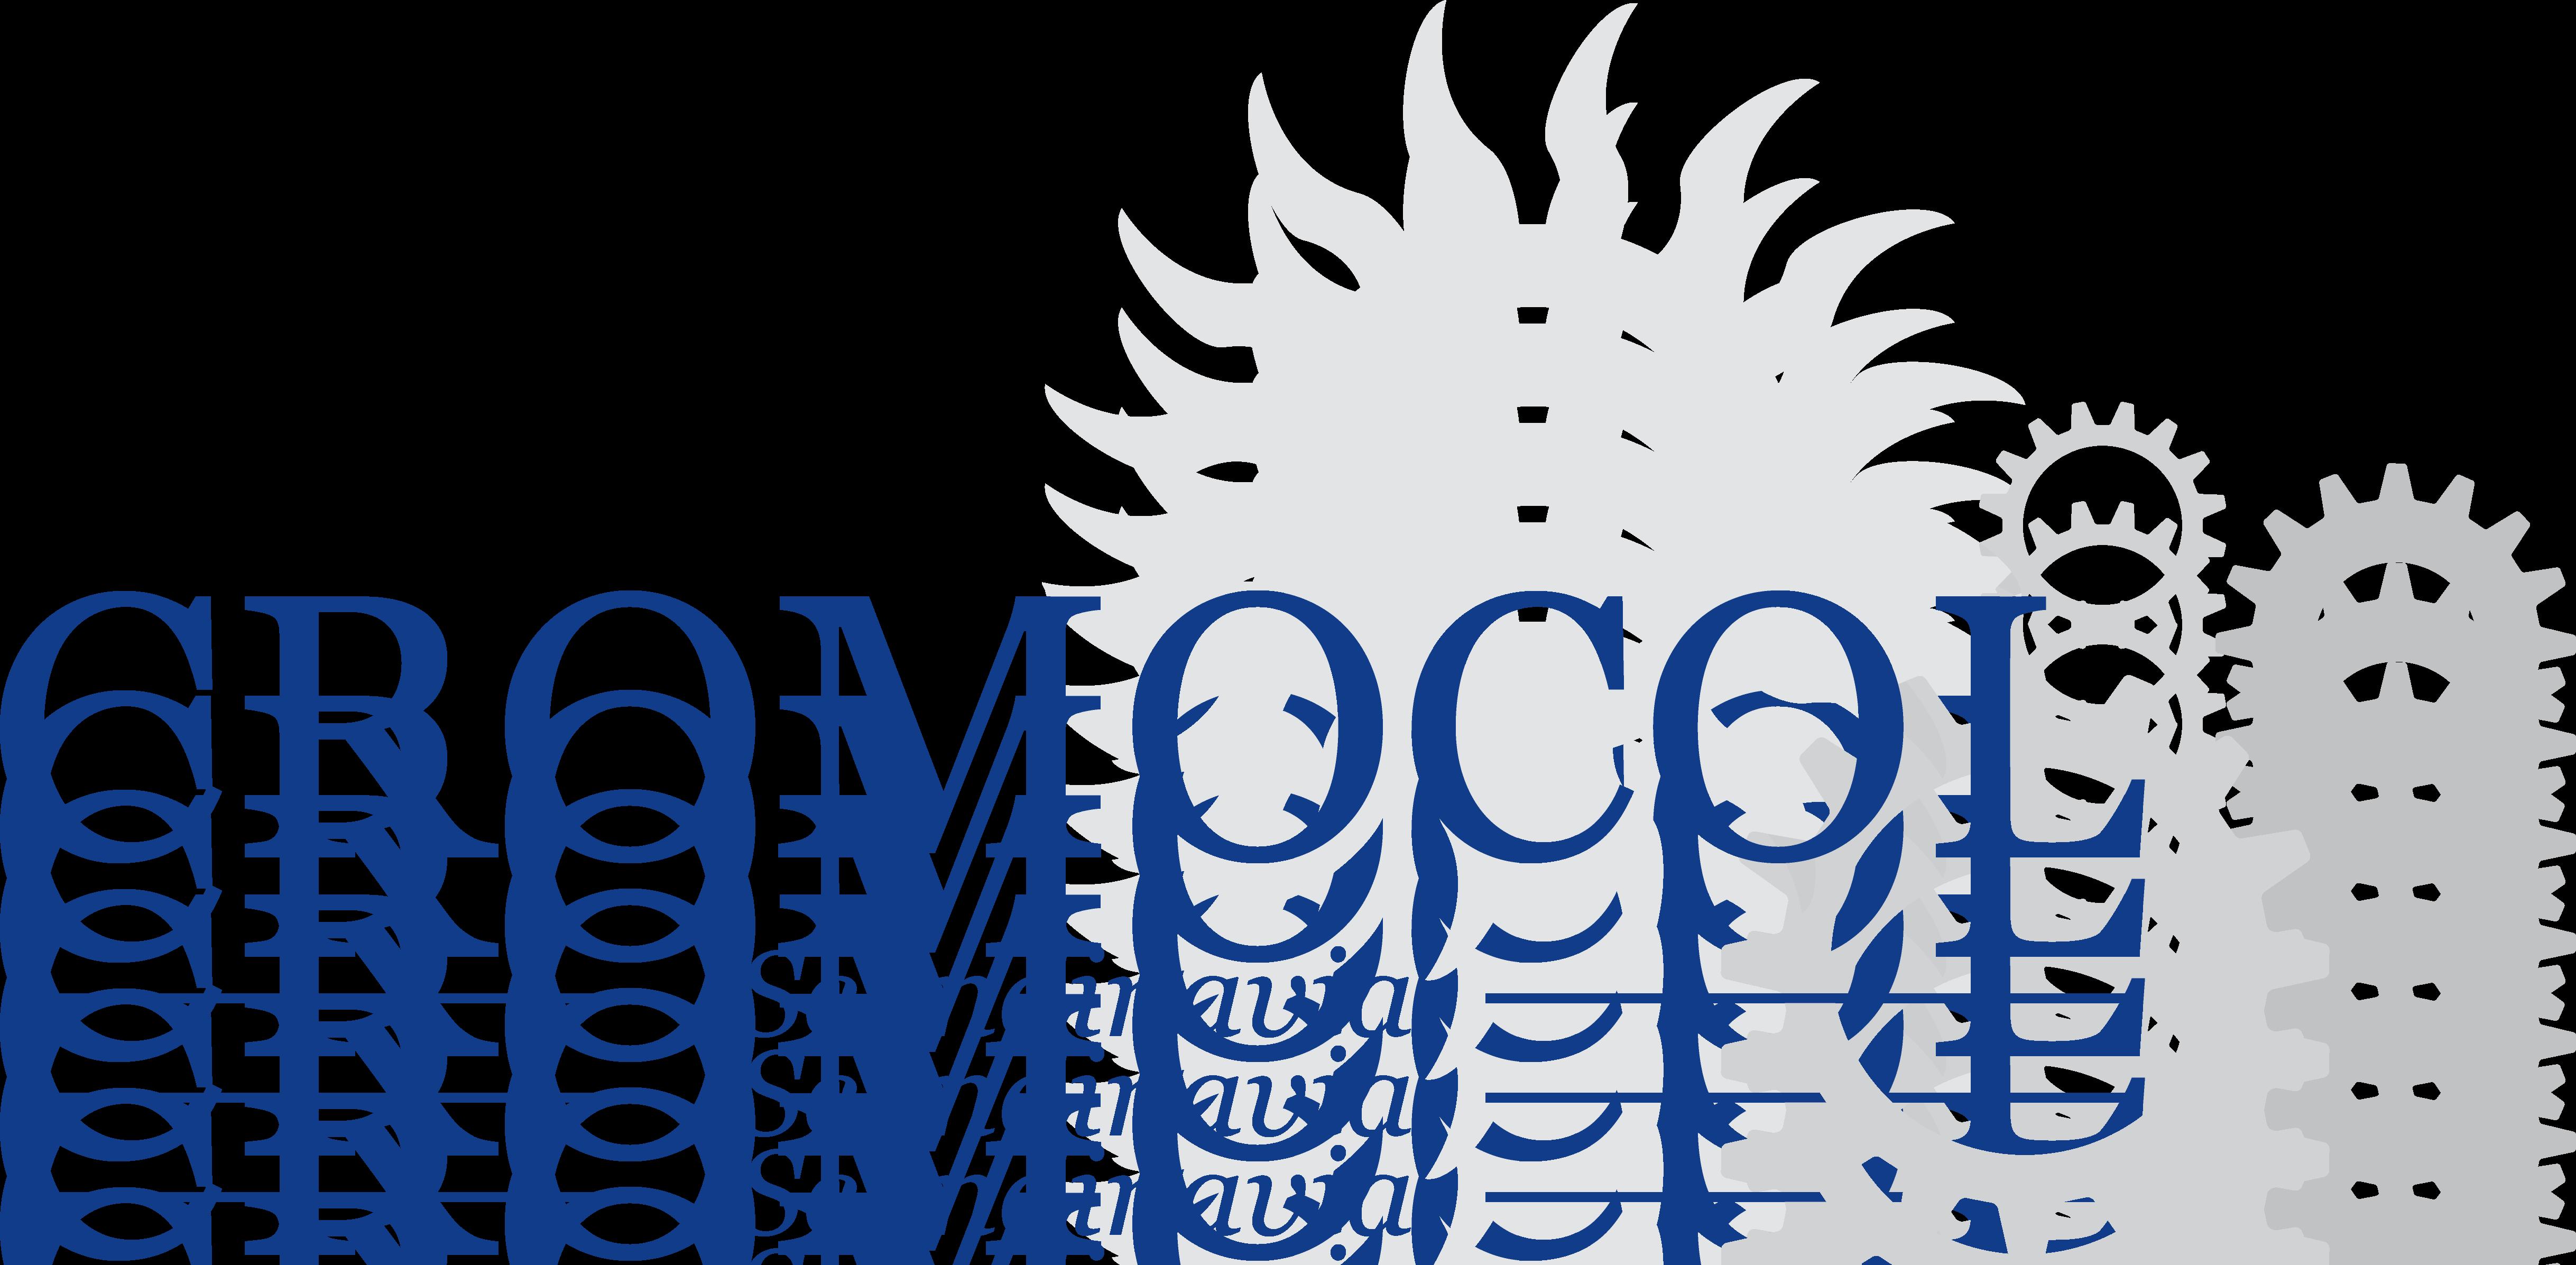 Cromocol Scandinavia AB